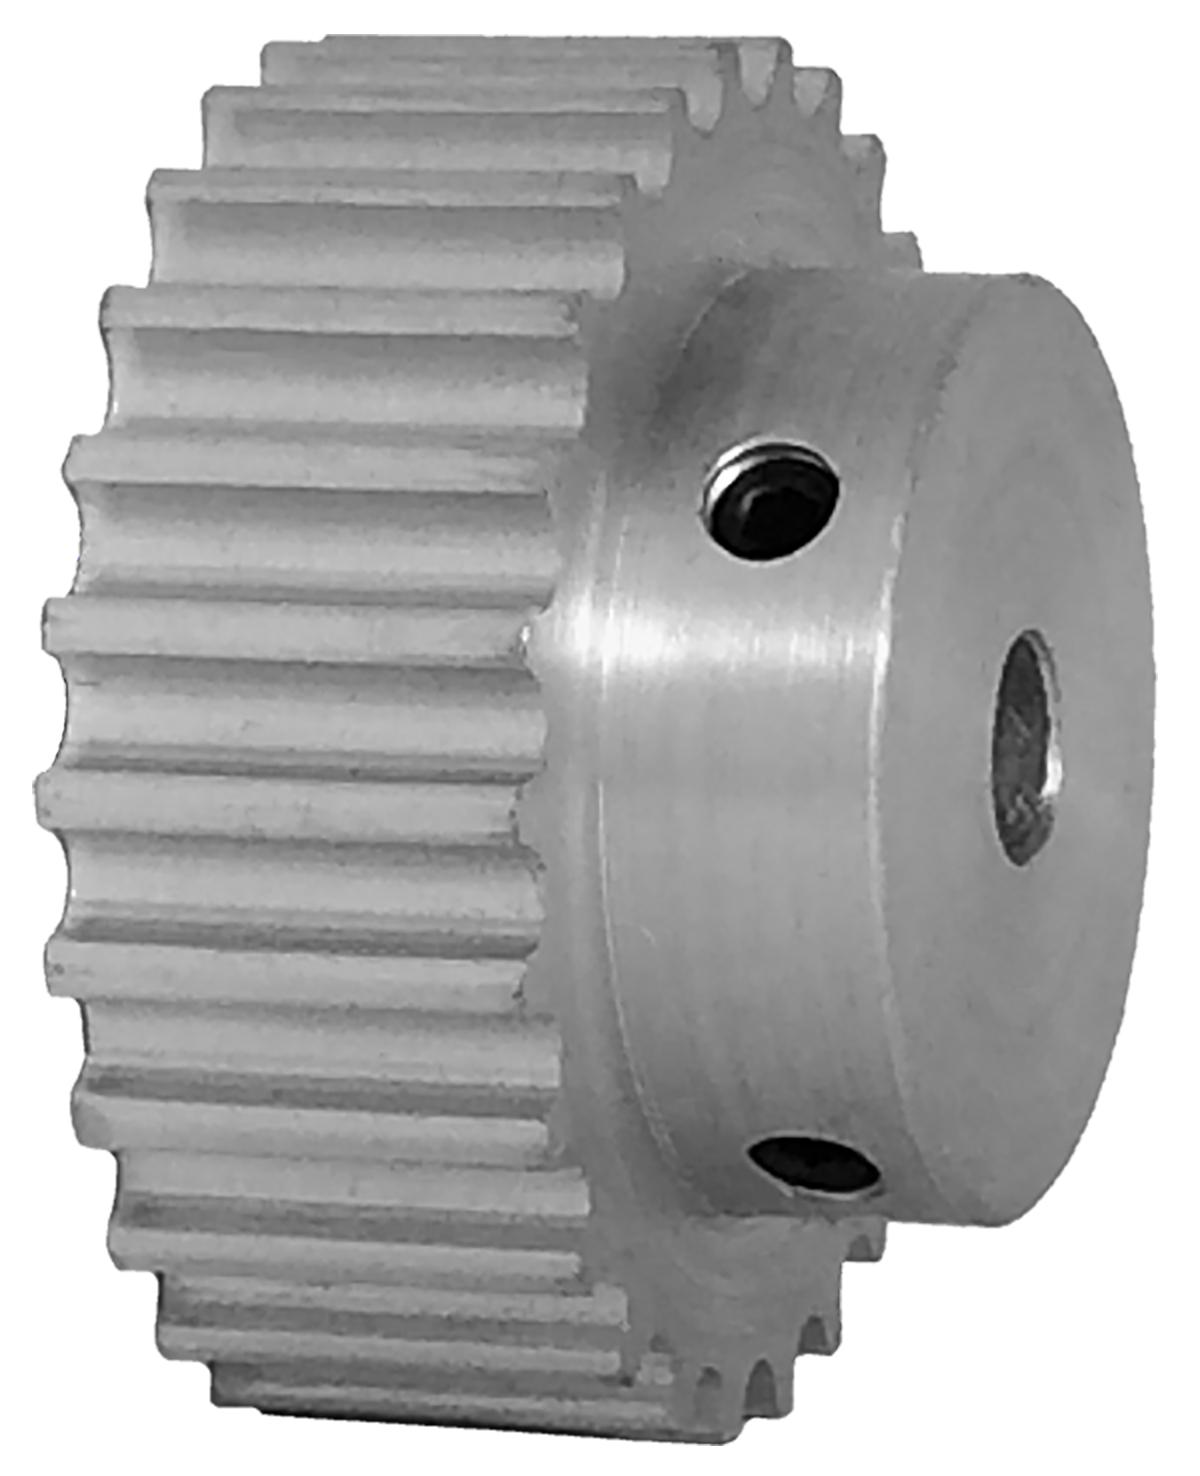 26-5M09-6A3 - Aluminum Powerhouse®HTD® Pulleys